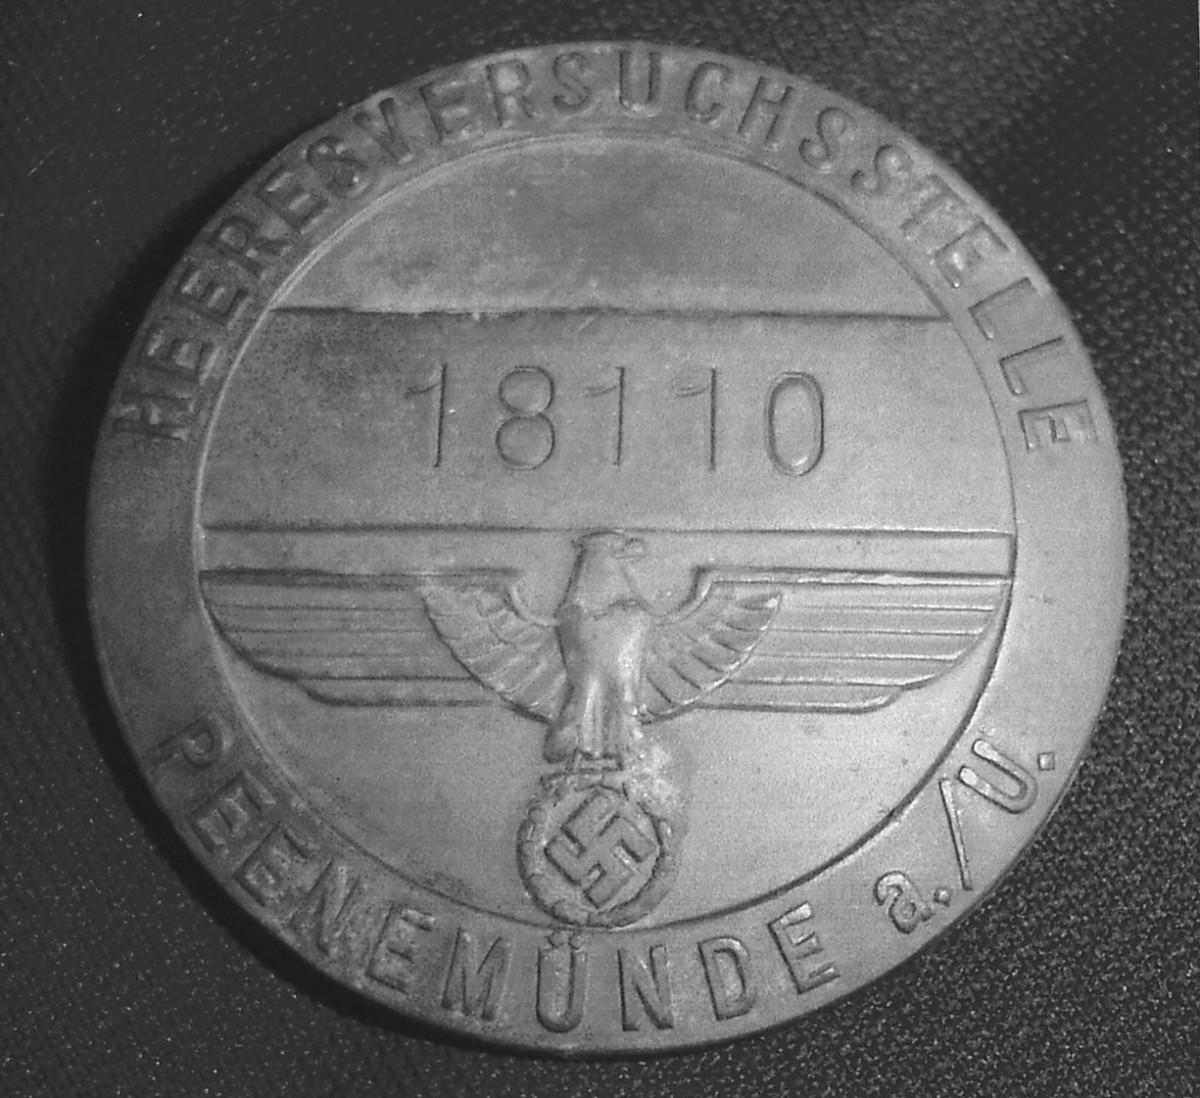 The enamel finish is worn off this rare Peenemünde Entrance Badge.